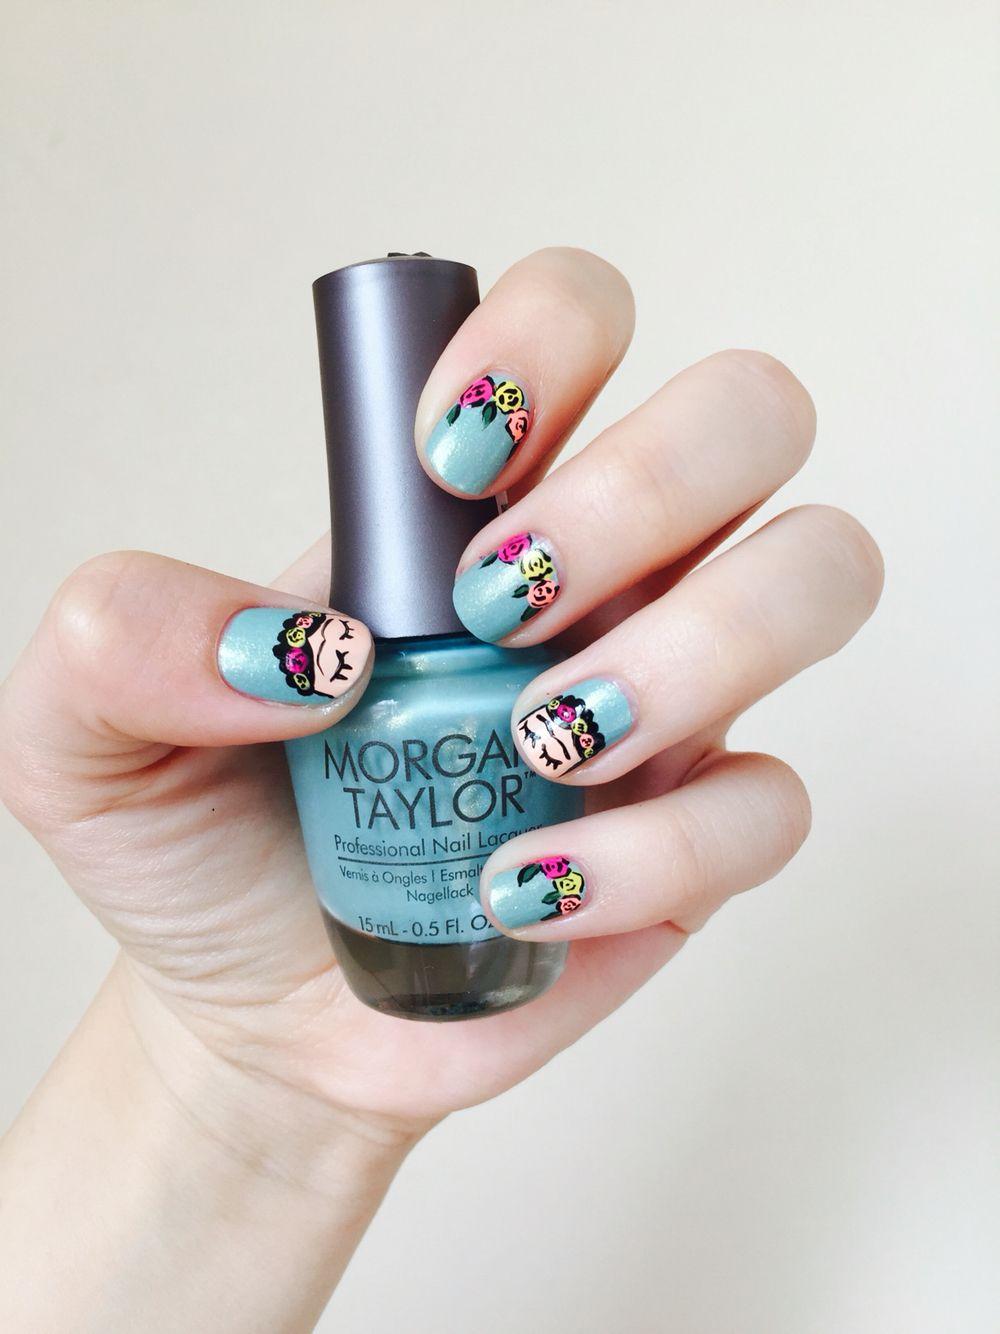 Uñas Frida Kahlo | nails art | Pinterest | Makeup, Manicure and Nail ...